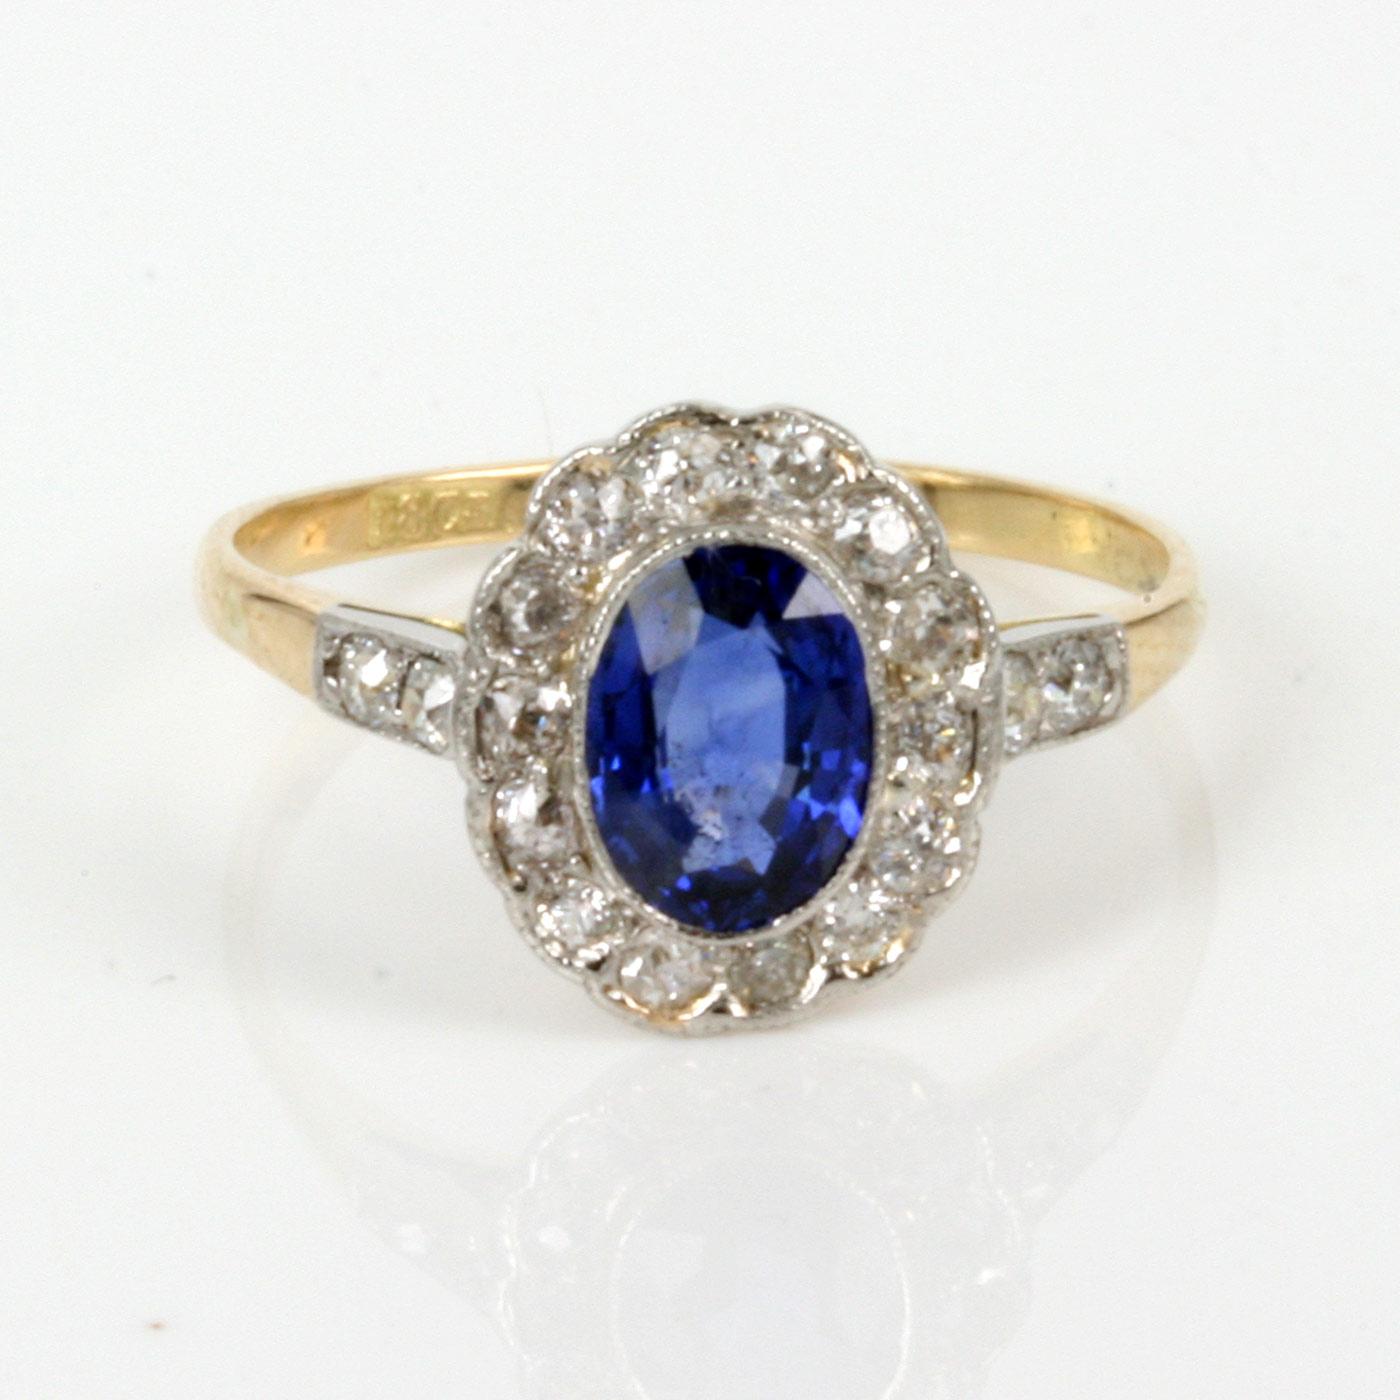 Sapphire As Engagement Ring Sapphire Diamond Ring